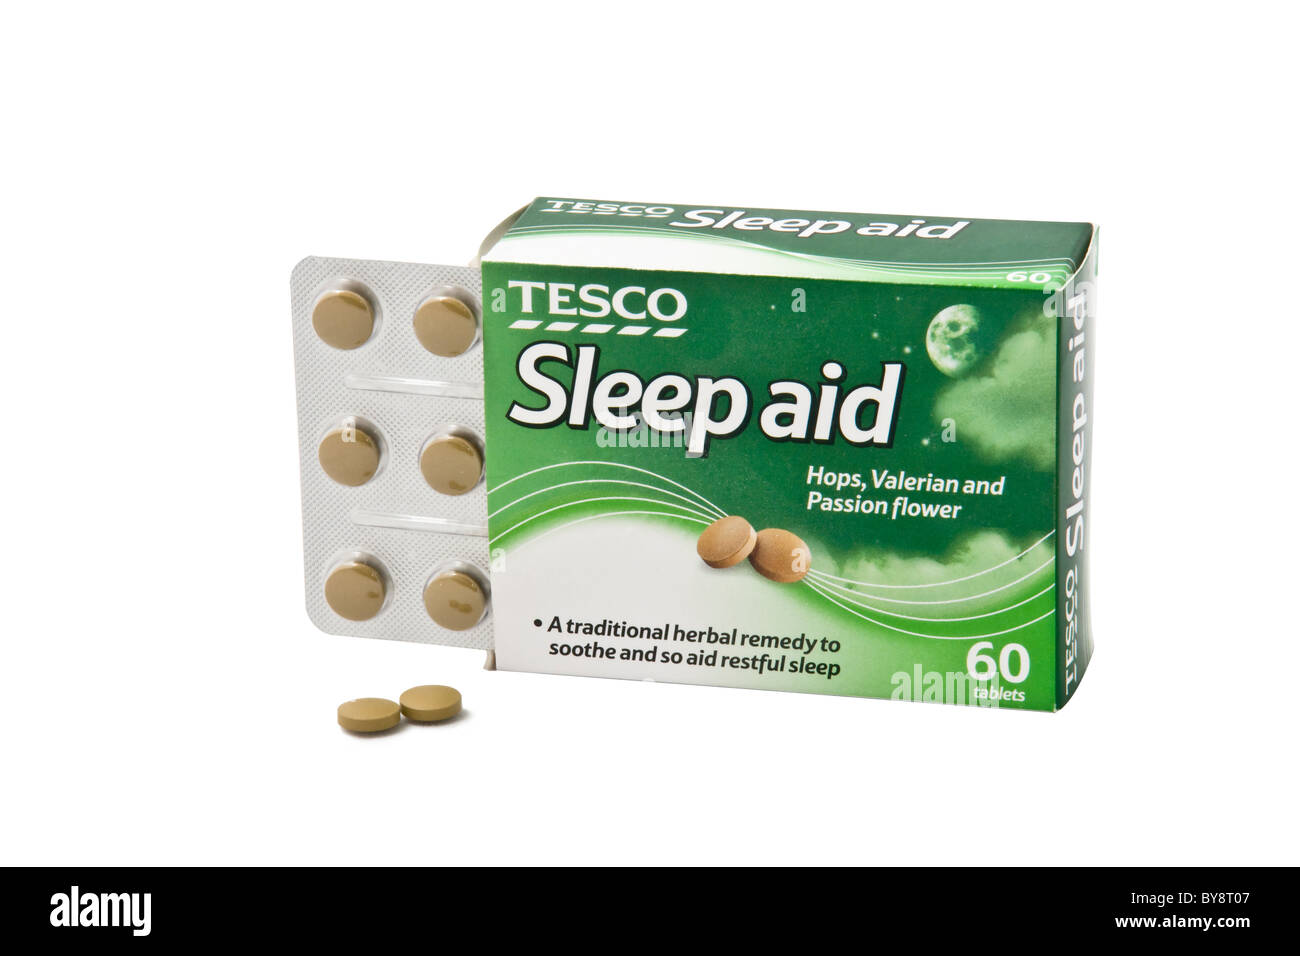 How to Make an Herbal Sleep Aid